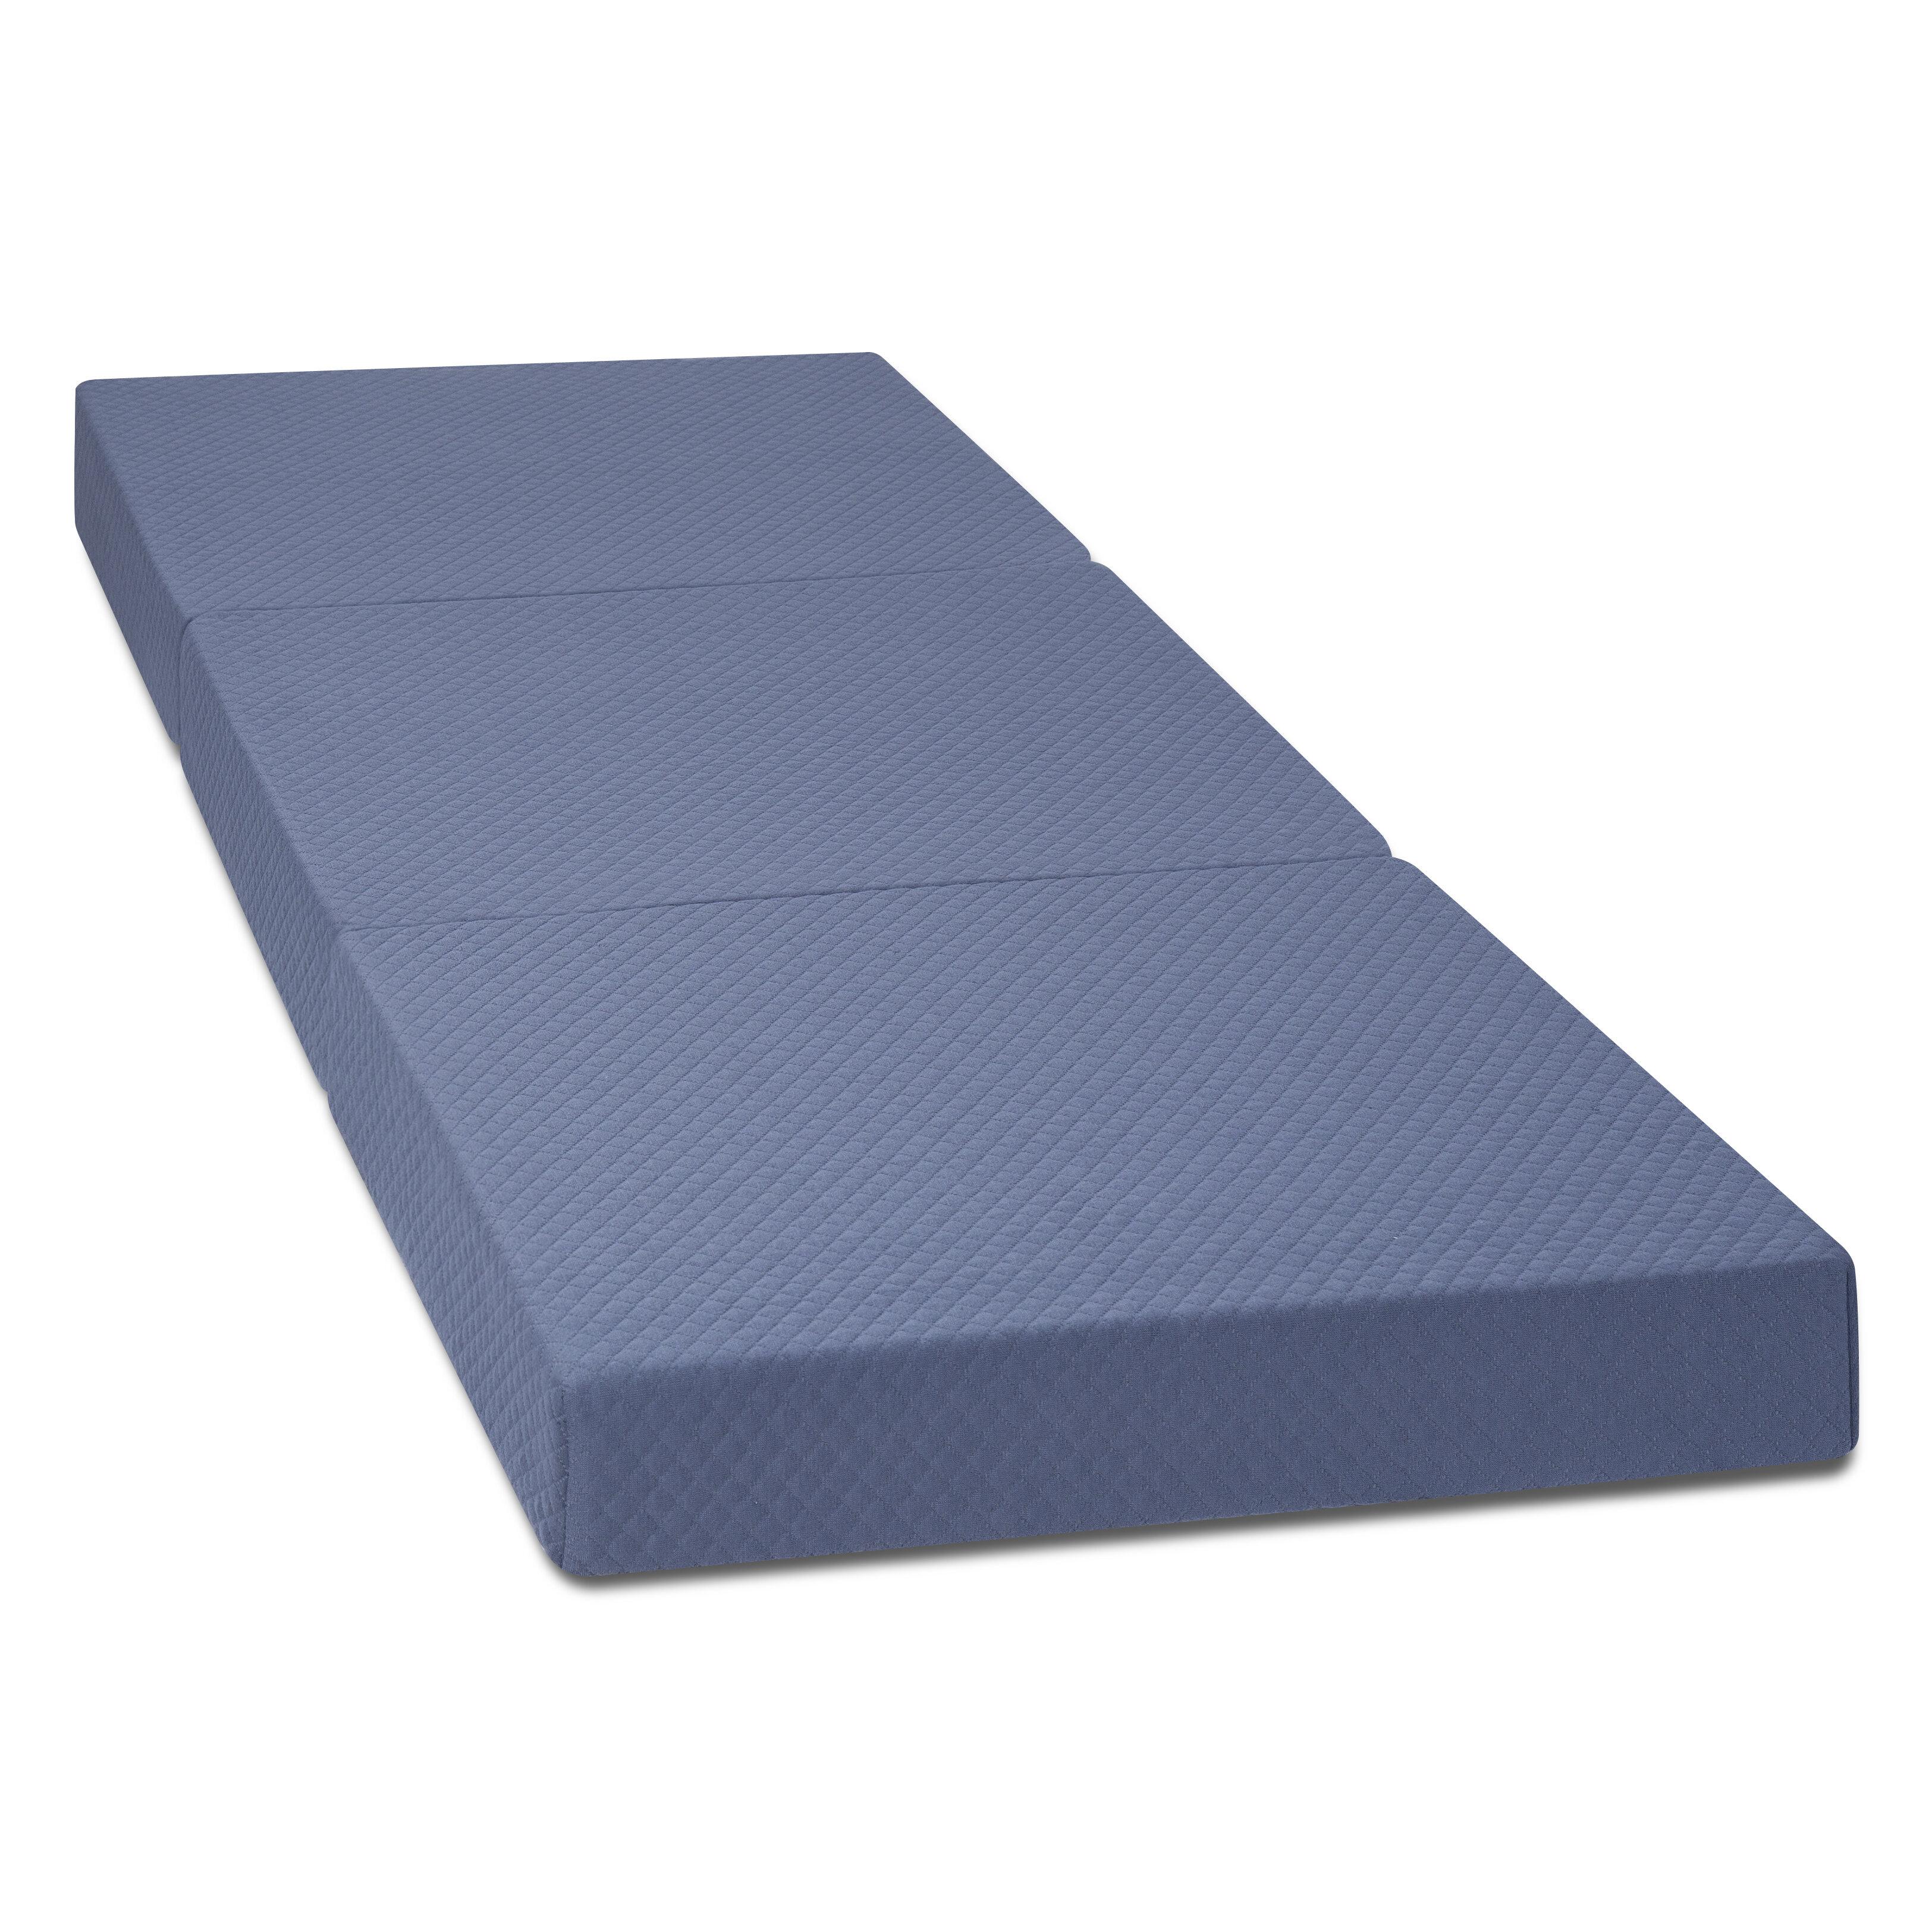 Folding Mattress Portable Foam Bed  Gym Mat  Guest Sleepover Yoga Camping